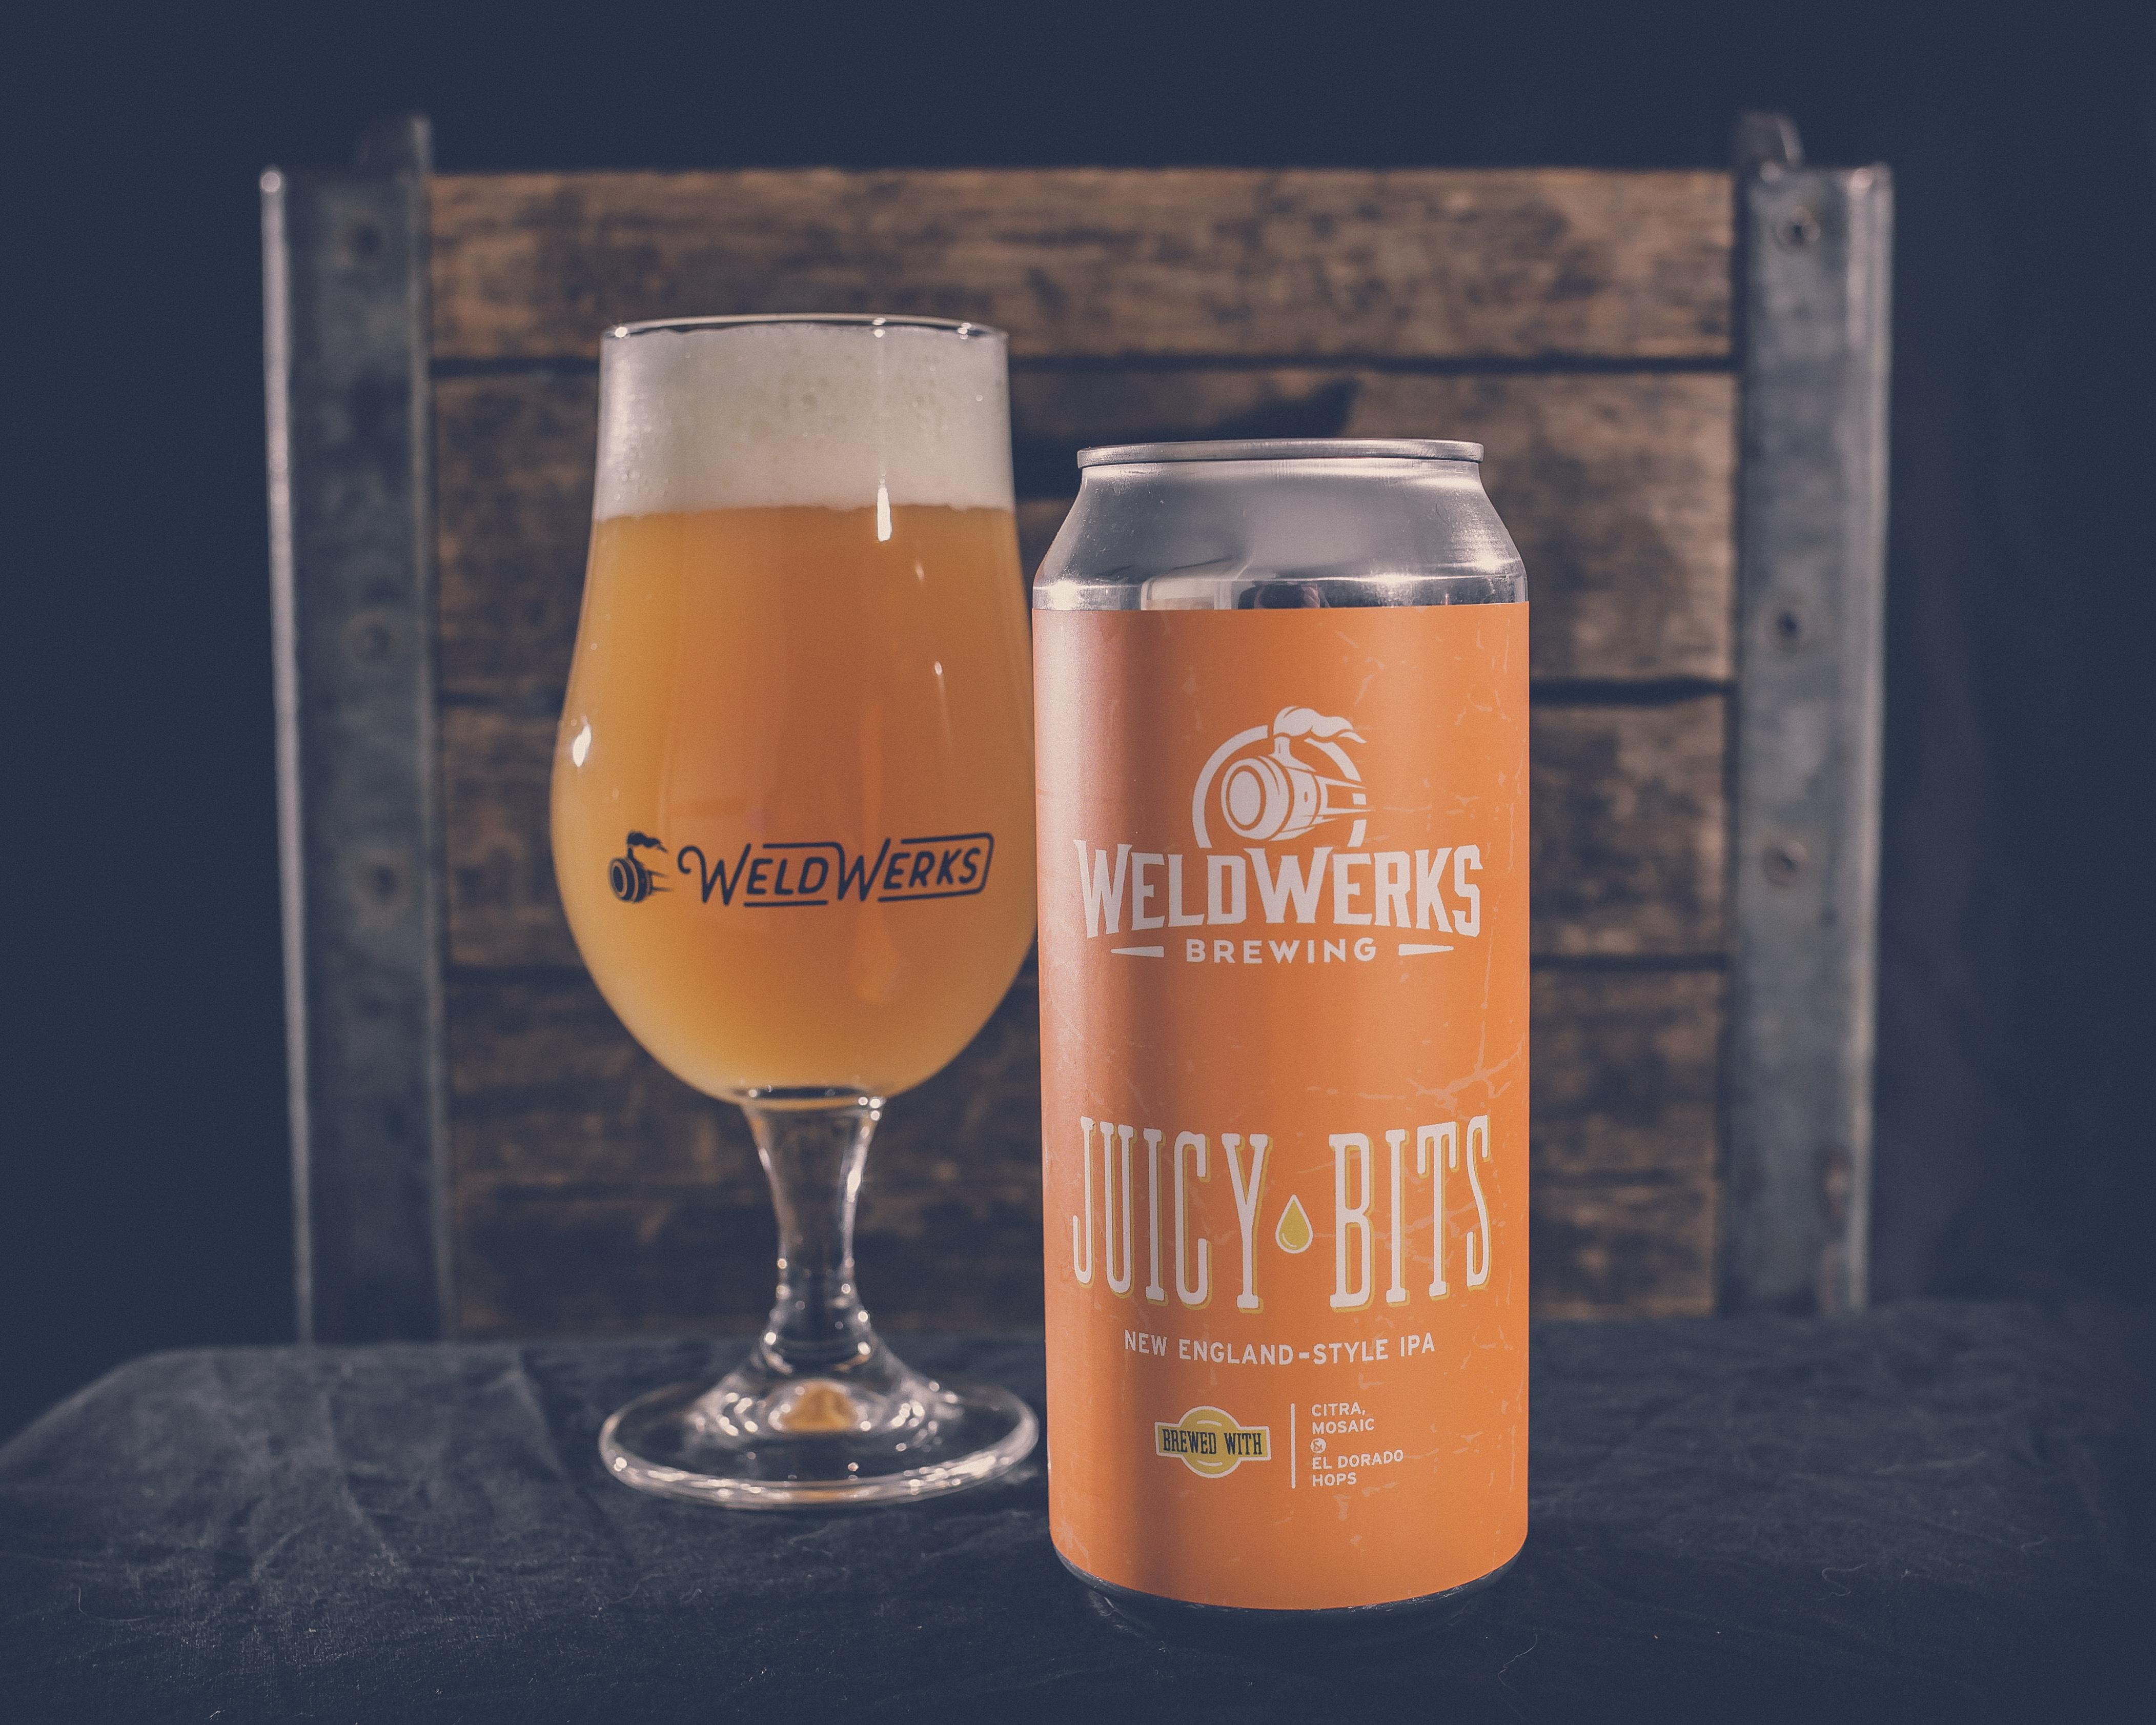 Weldwerks Brewing Co To Open Second Location In Colorado Springs